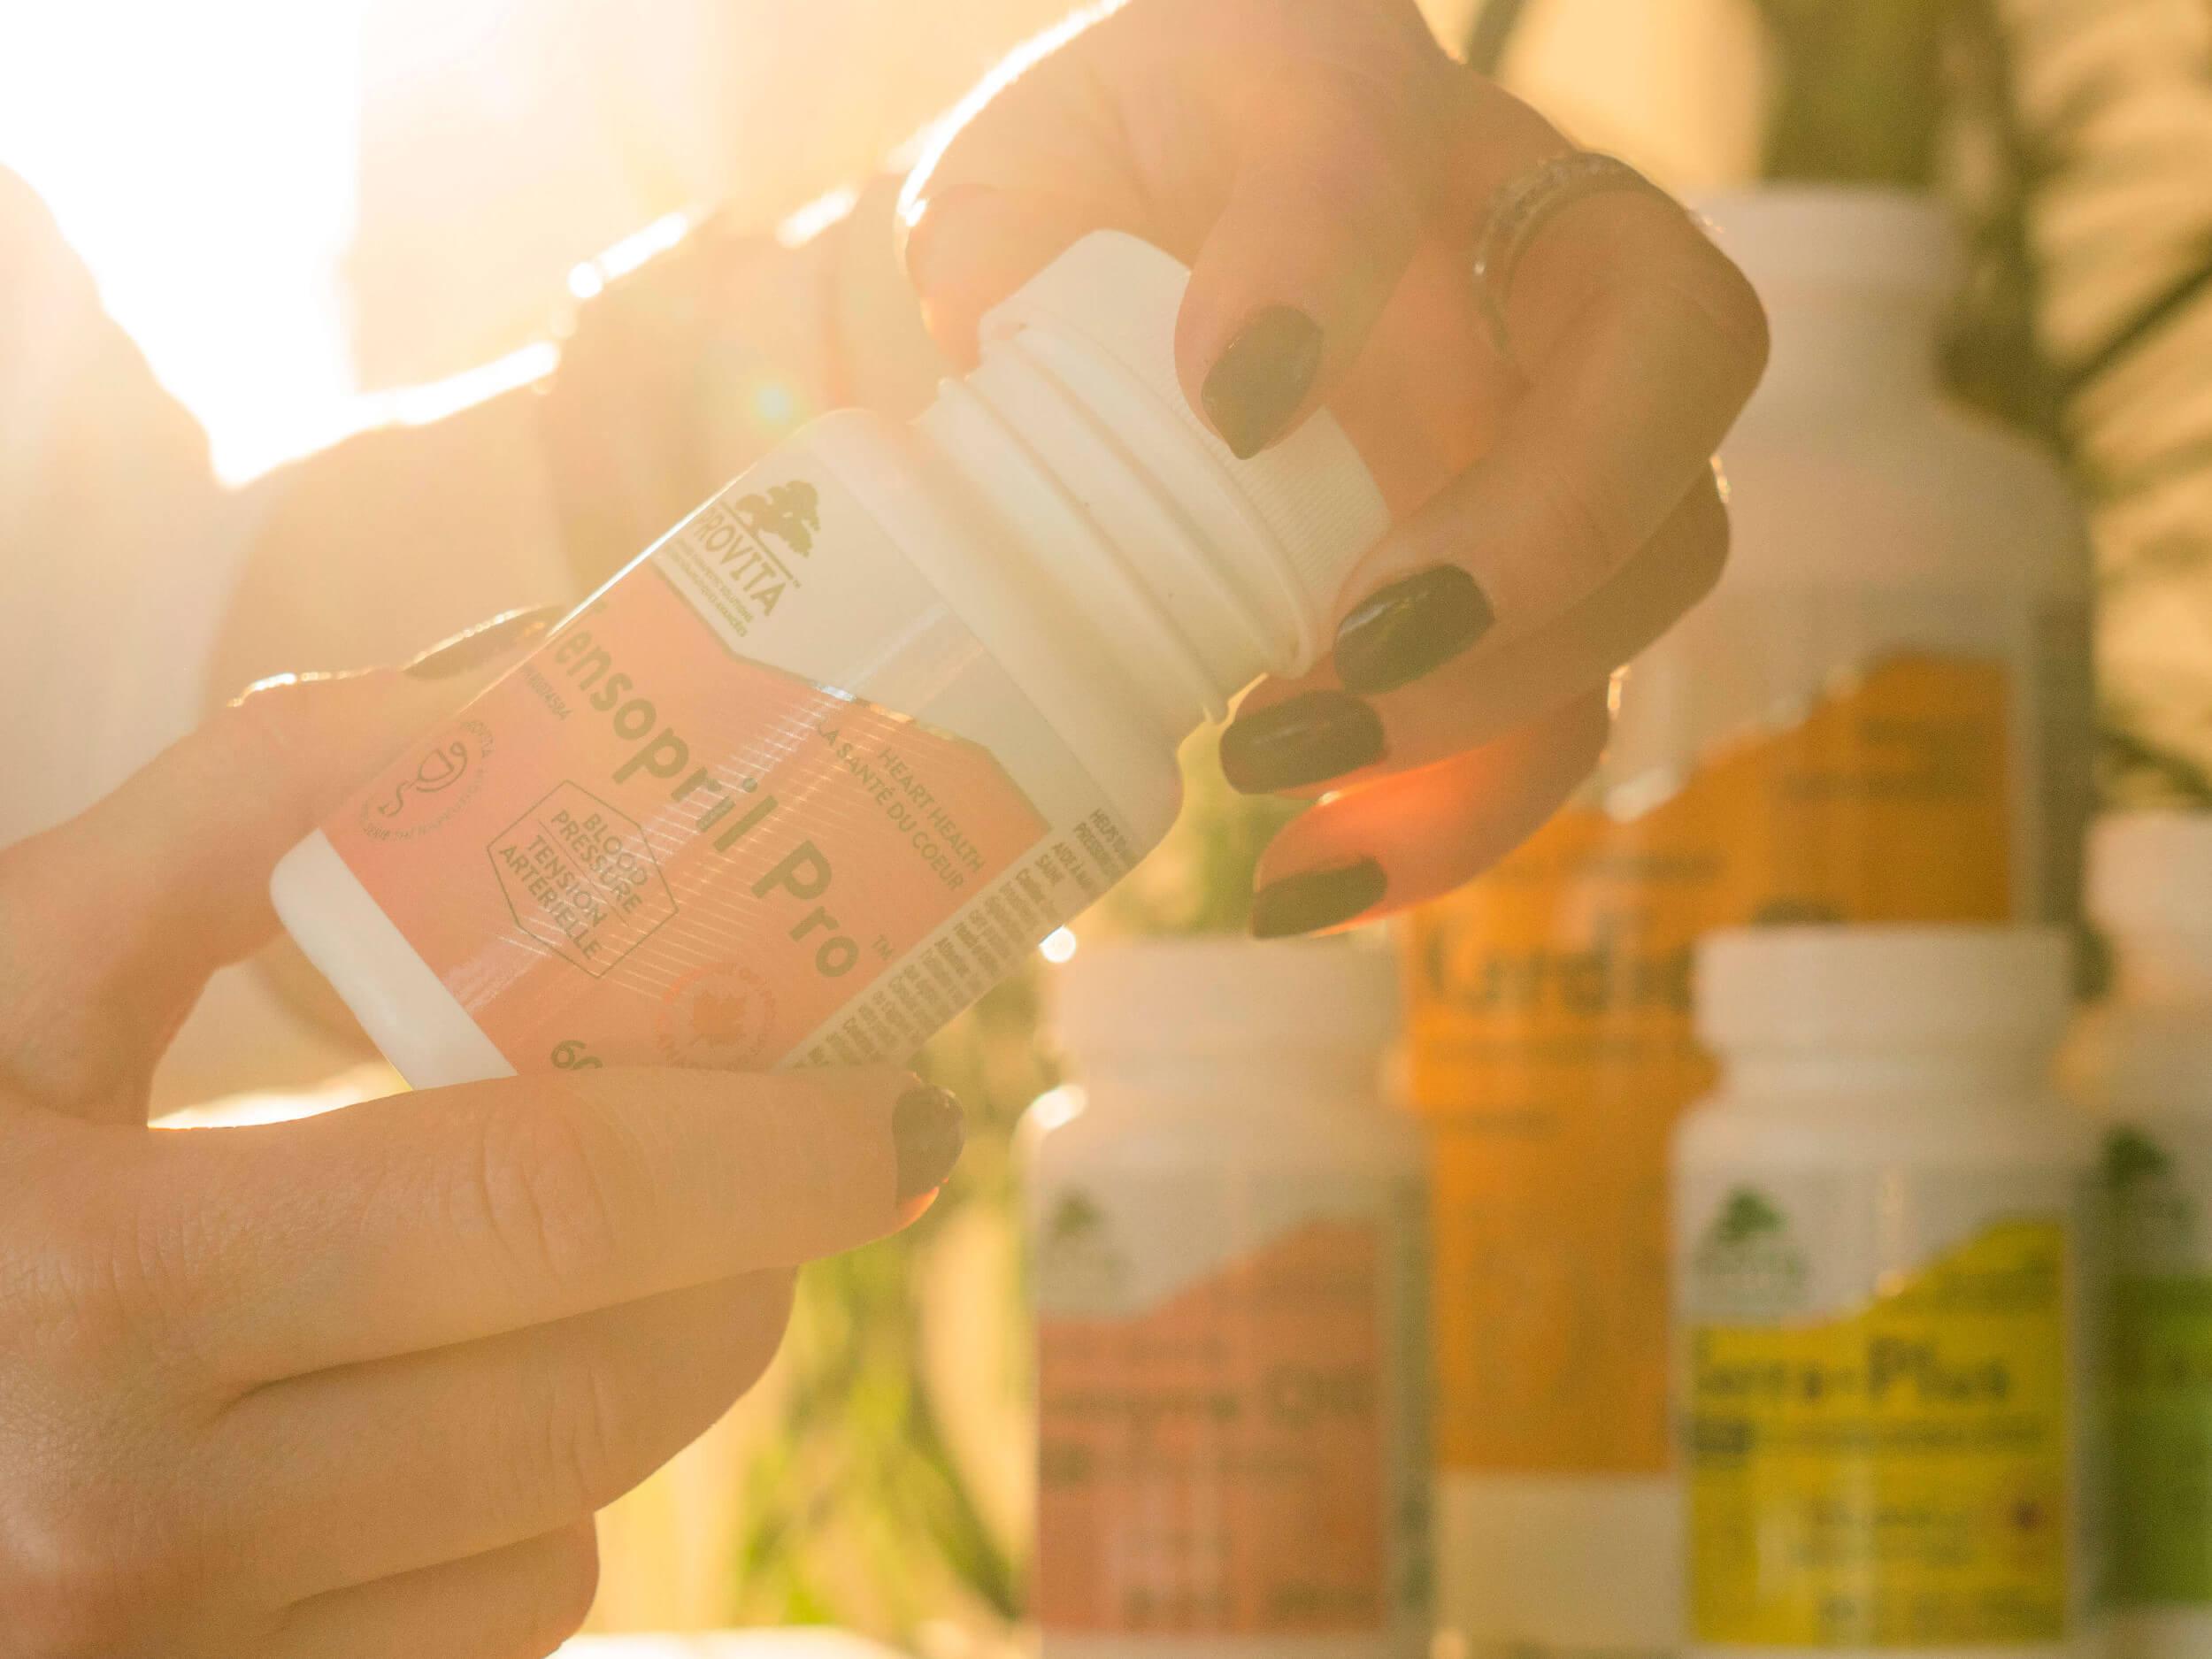 Provita Nutrition - висококачествени здравни продукти от LanaBG